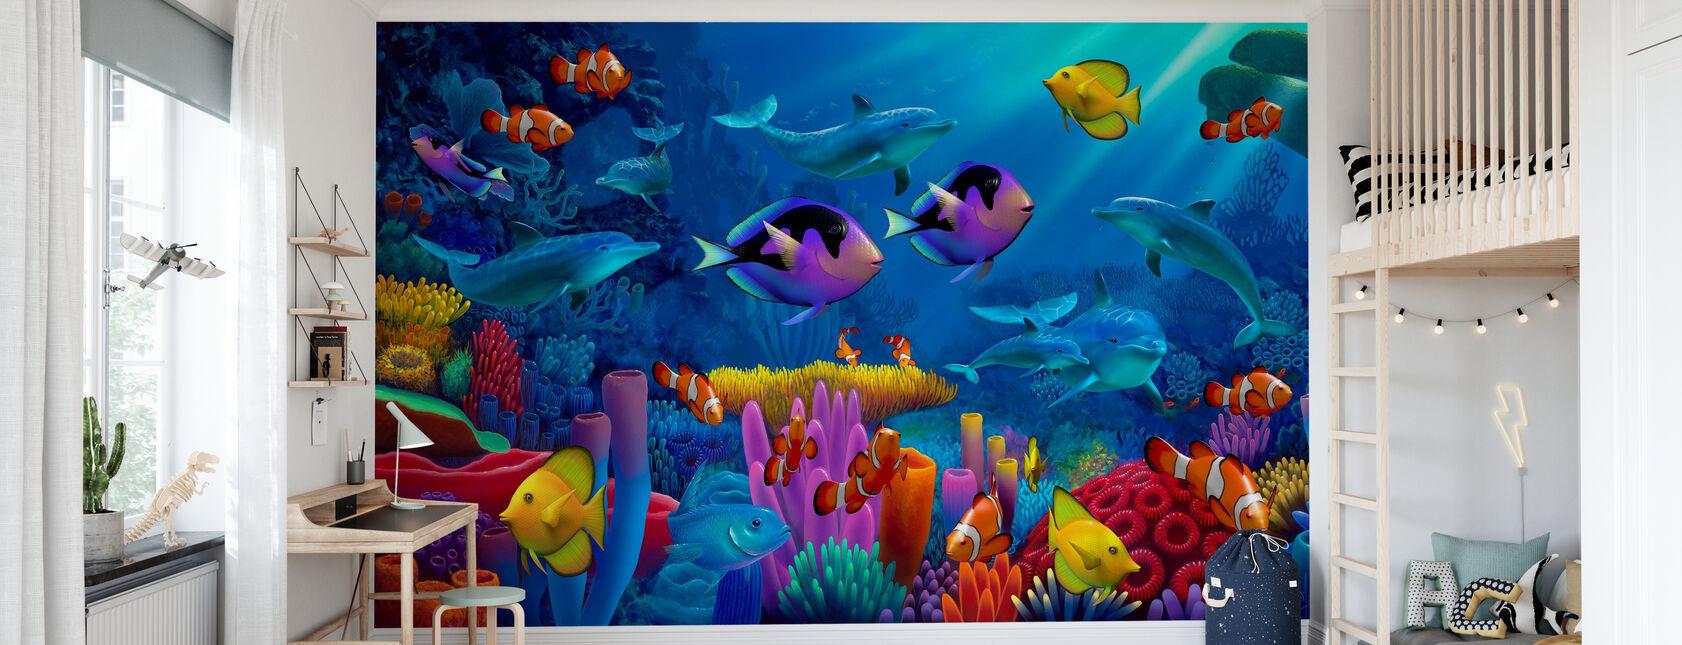 Oceaan van kleur - Behang - Kinderkamer